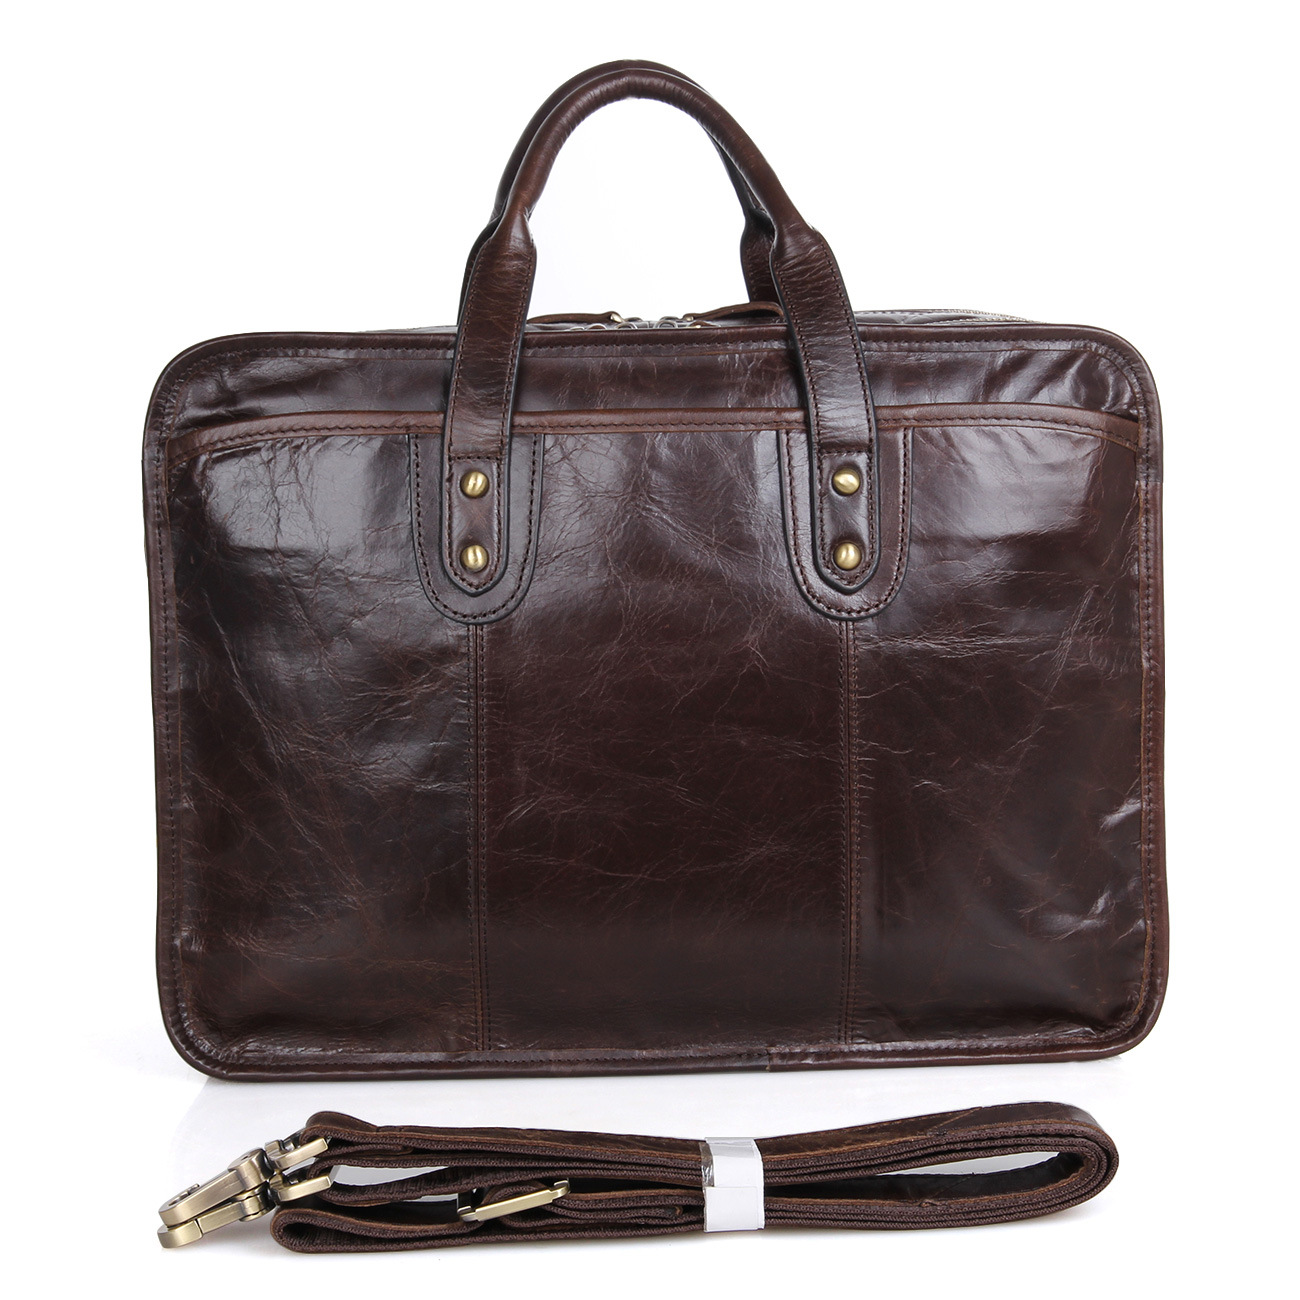 Men Messenger Bags Men's Genuine Leather Briefcase 15 Inch Laptop Handbag Real Pc Shoulder Bag Cow Business Large Case jacodel unisex waterproof 13 14 15 15 6 inch laptop shoulder bag for men women 2017 notbook bag 15 6 14 13 3 inch messenger bags